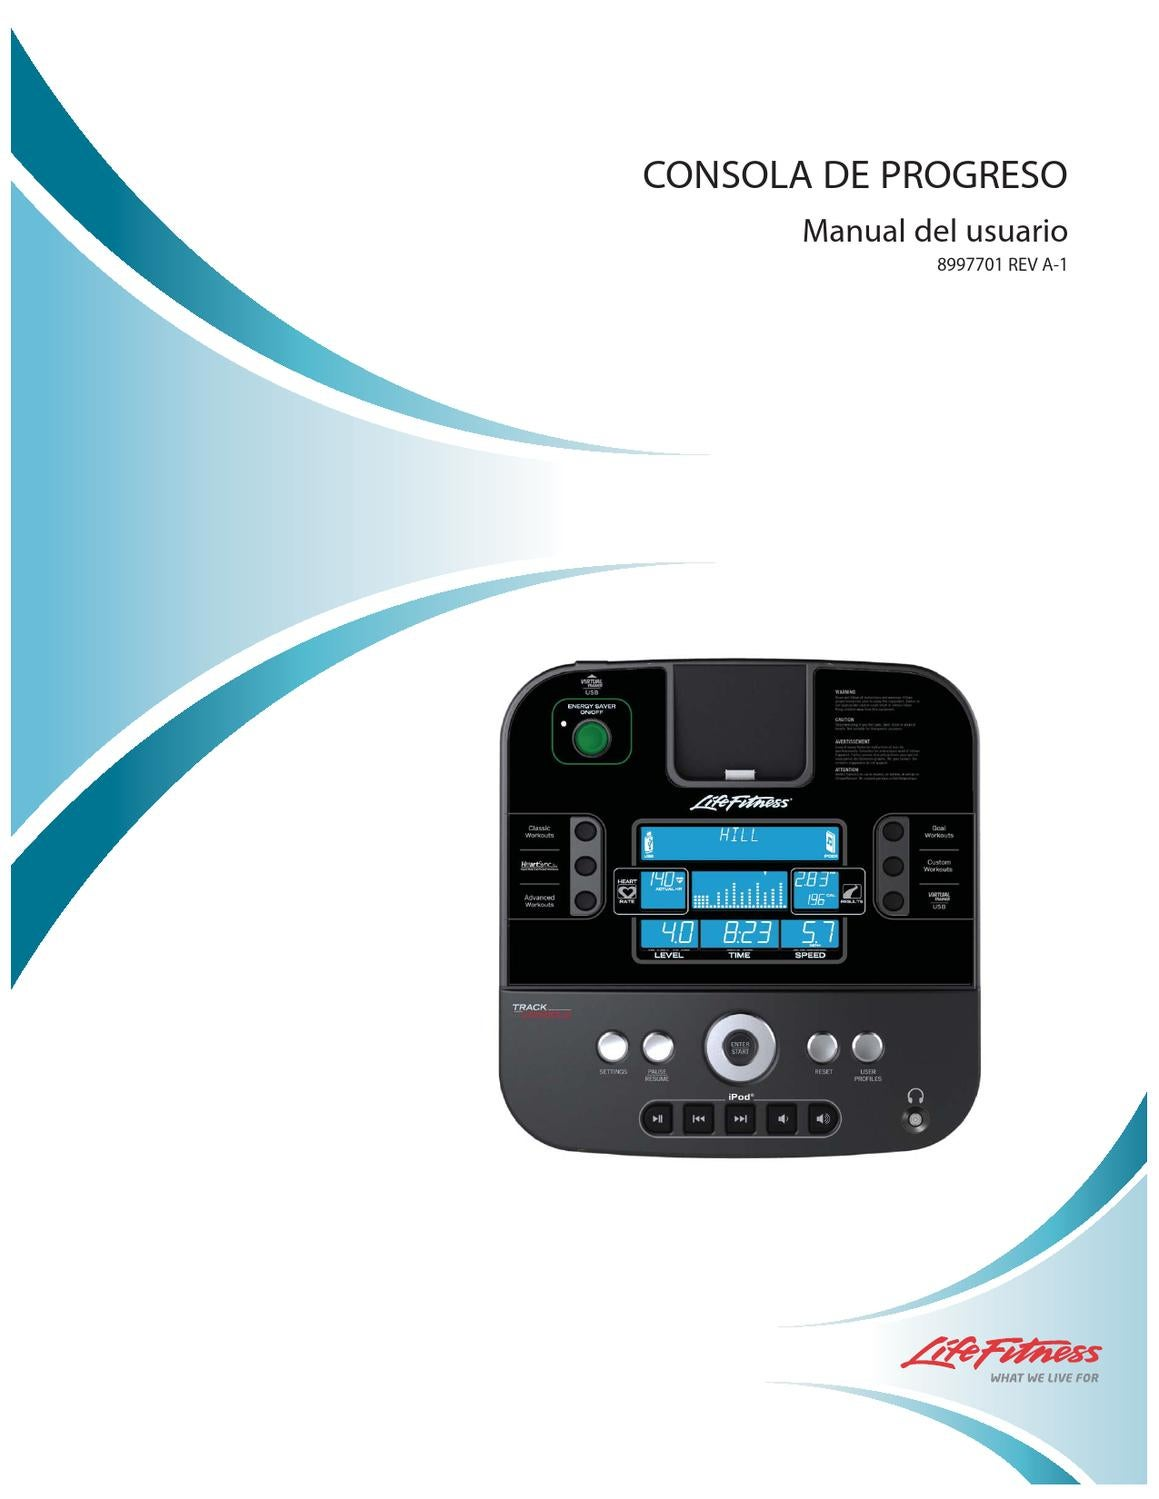 Manual instrucciones Consola Track by GymCompany Spain - issuu